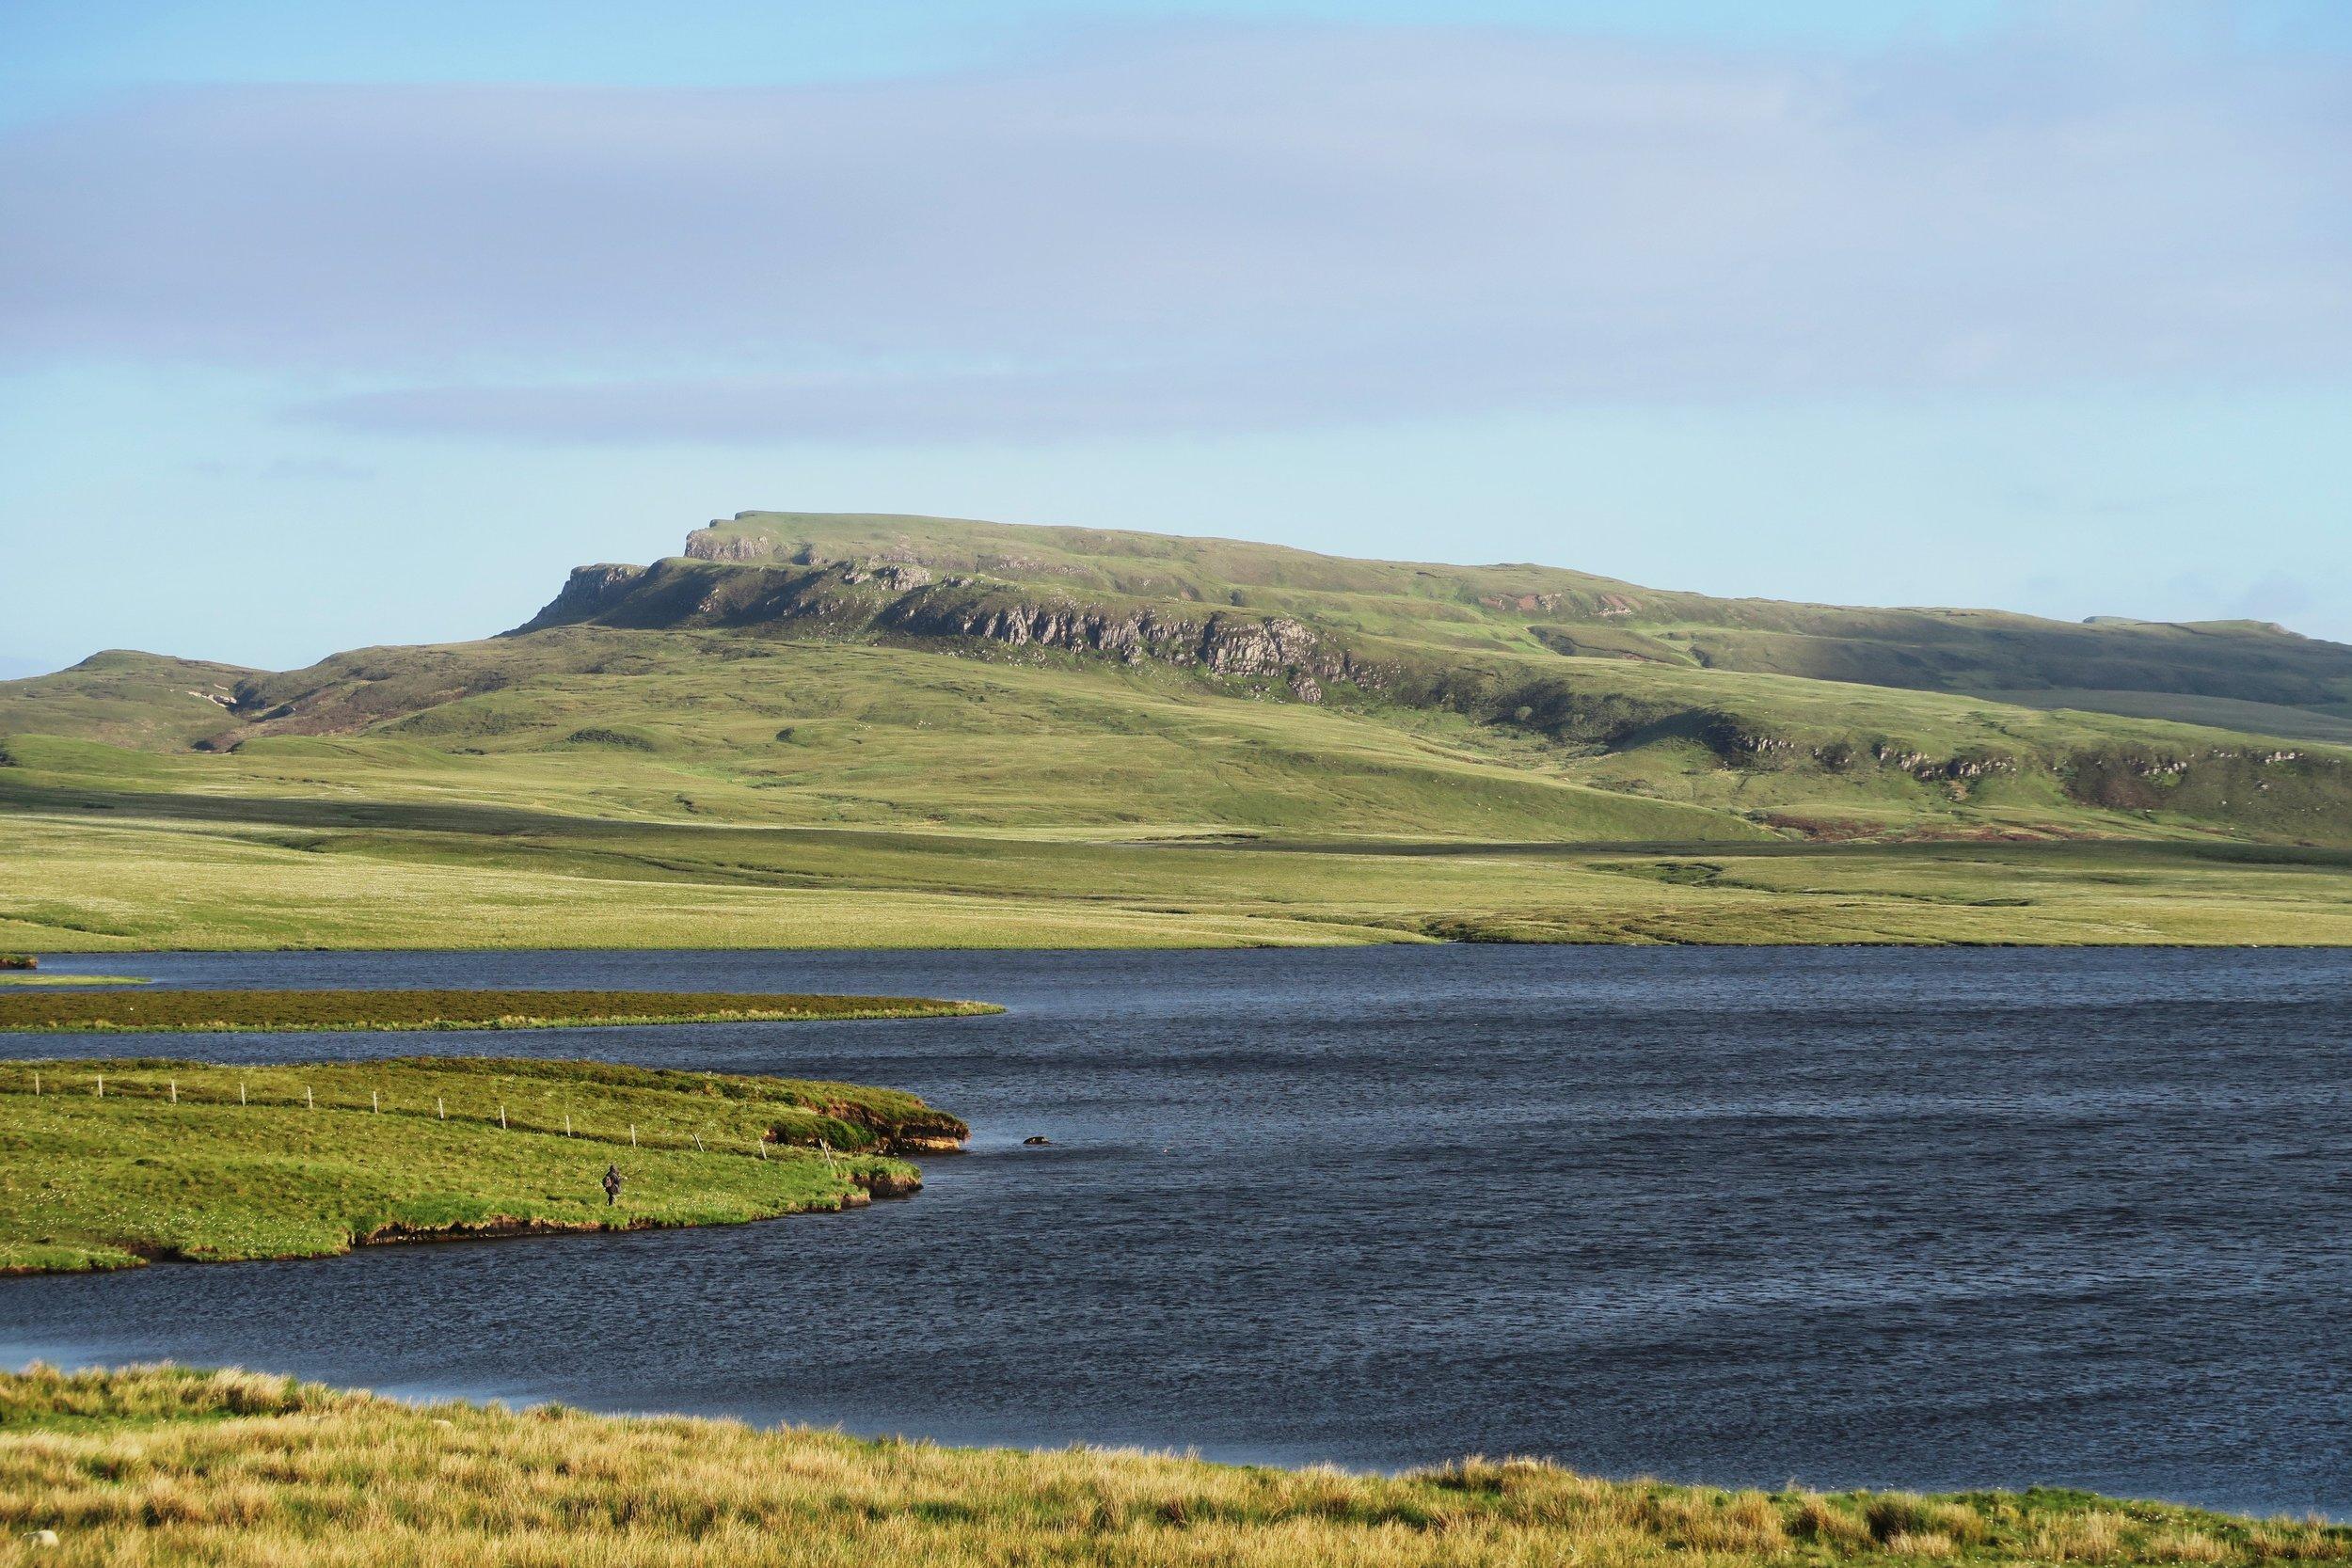 Portree, Scotland. Photo by George Hiles